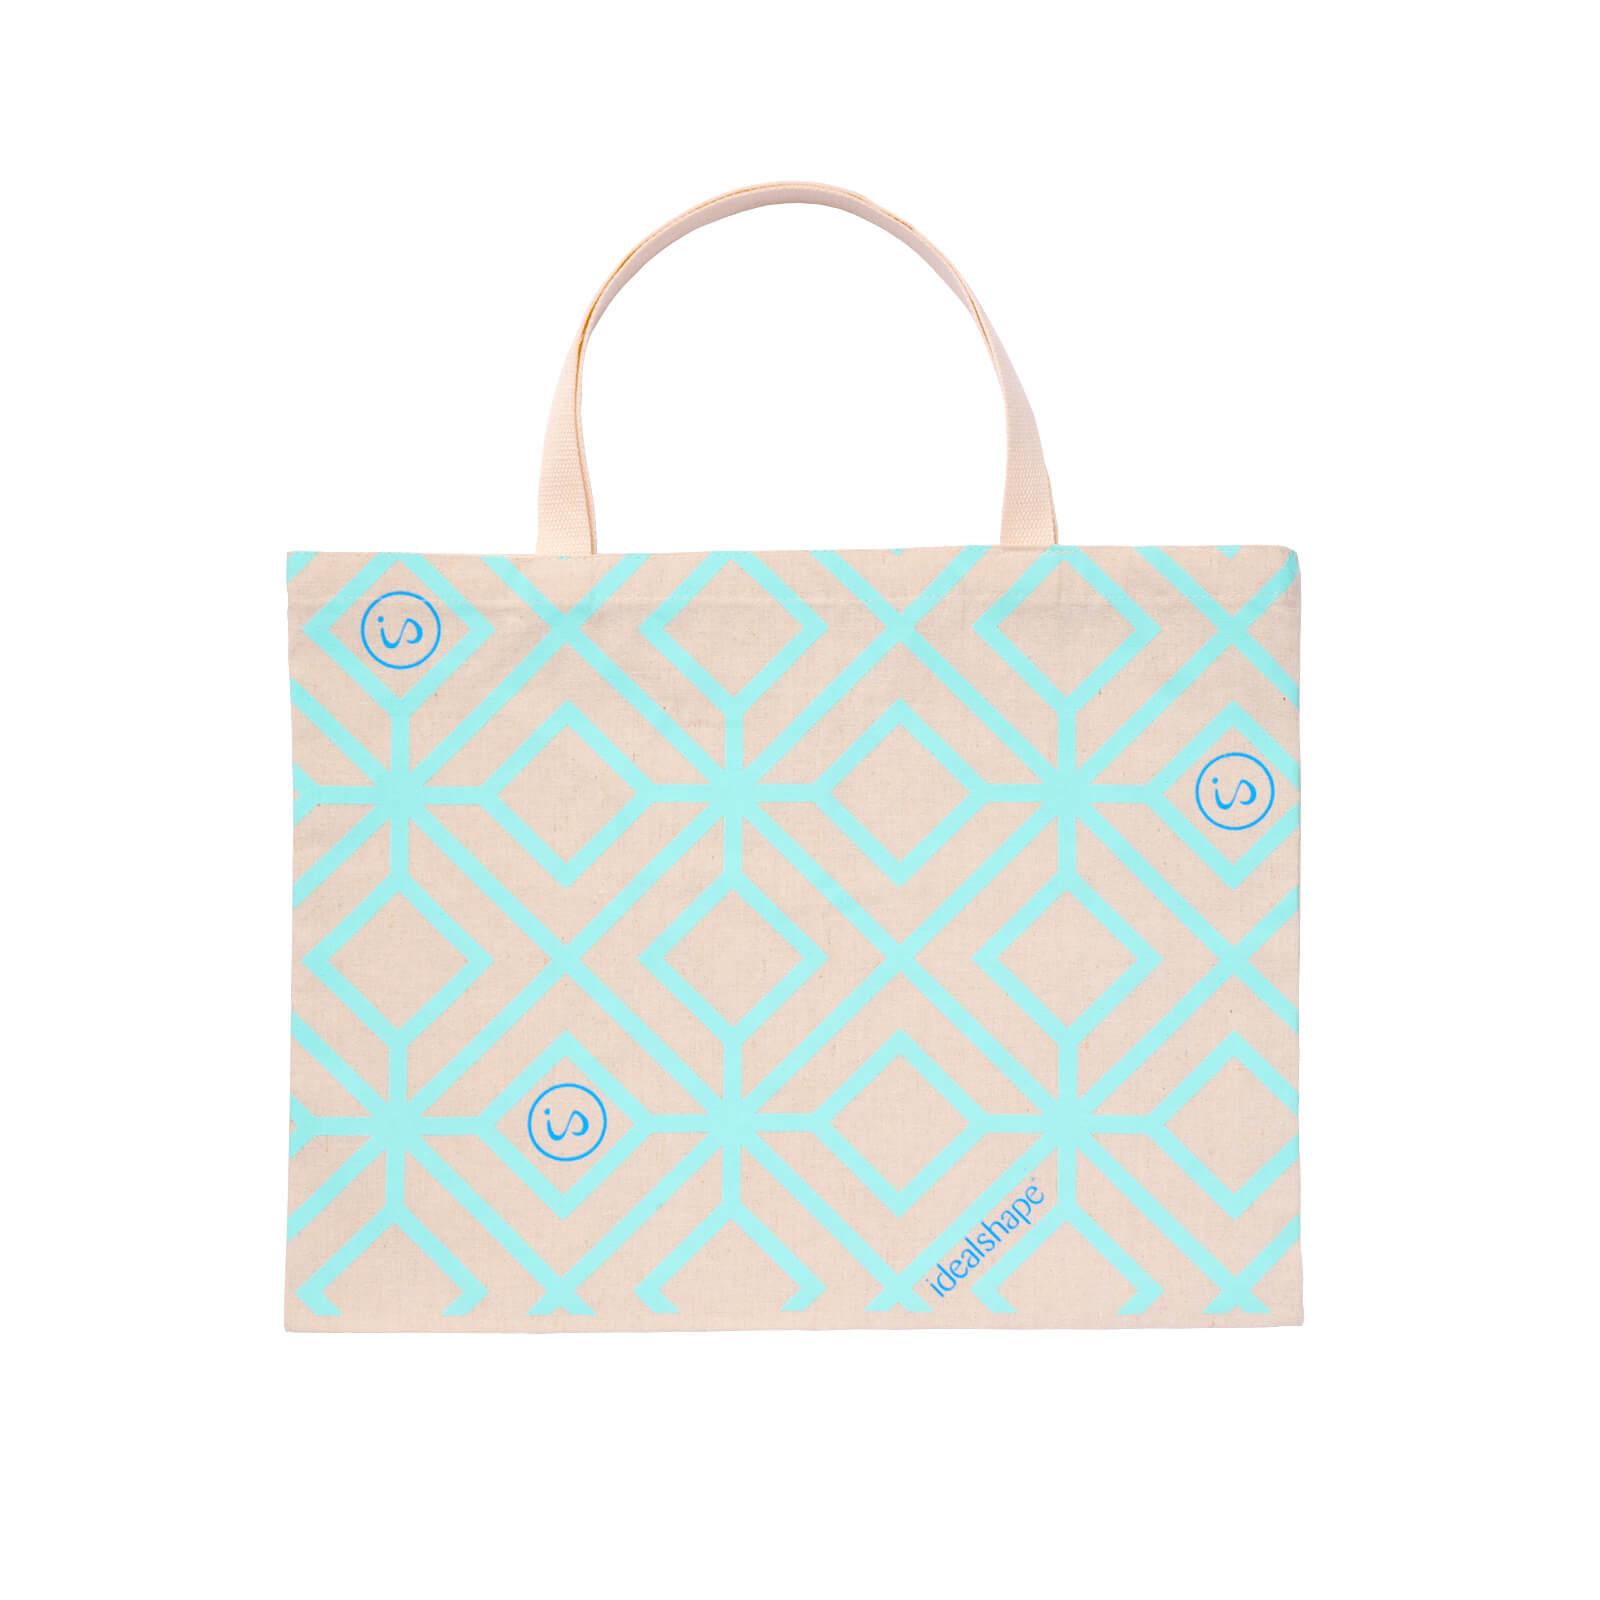 IdealShape Limited Edition IdealTote Bag